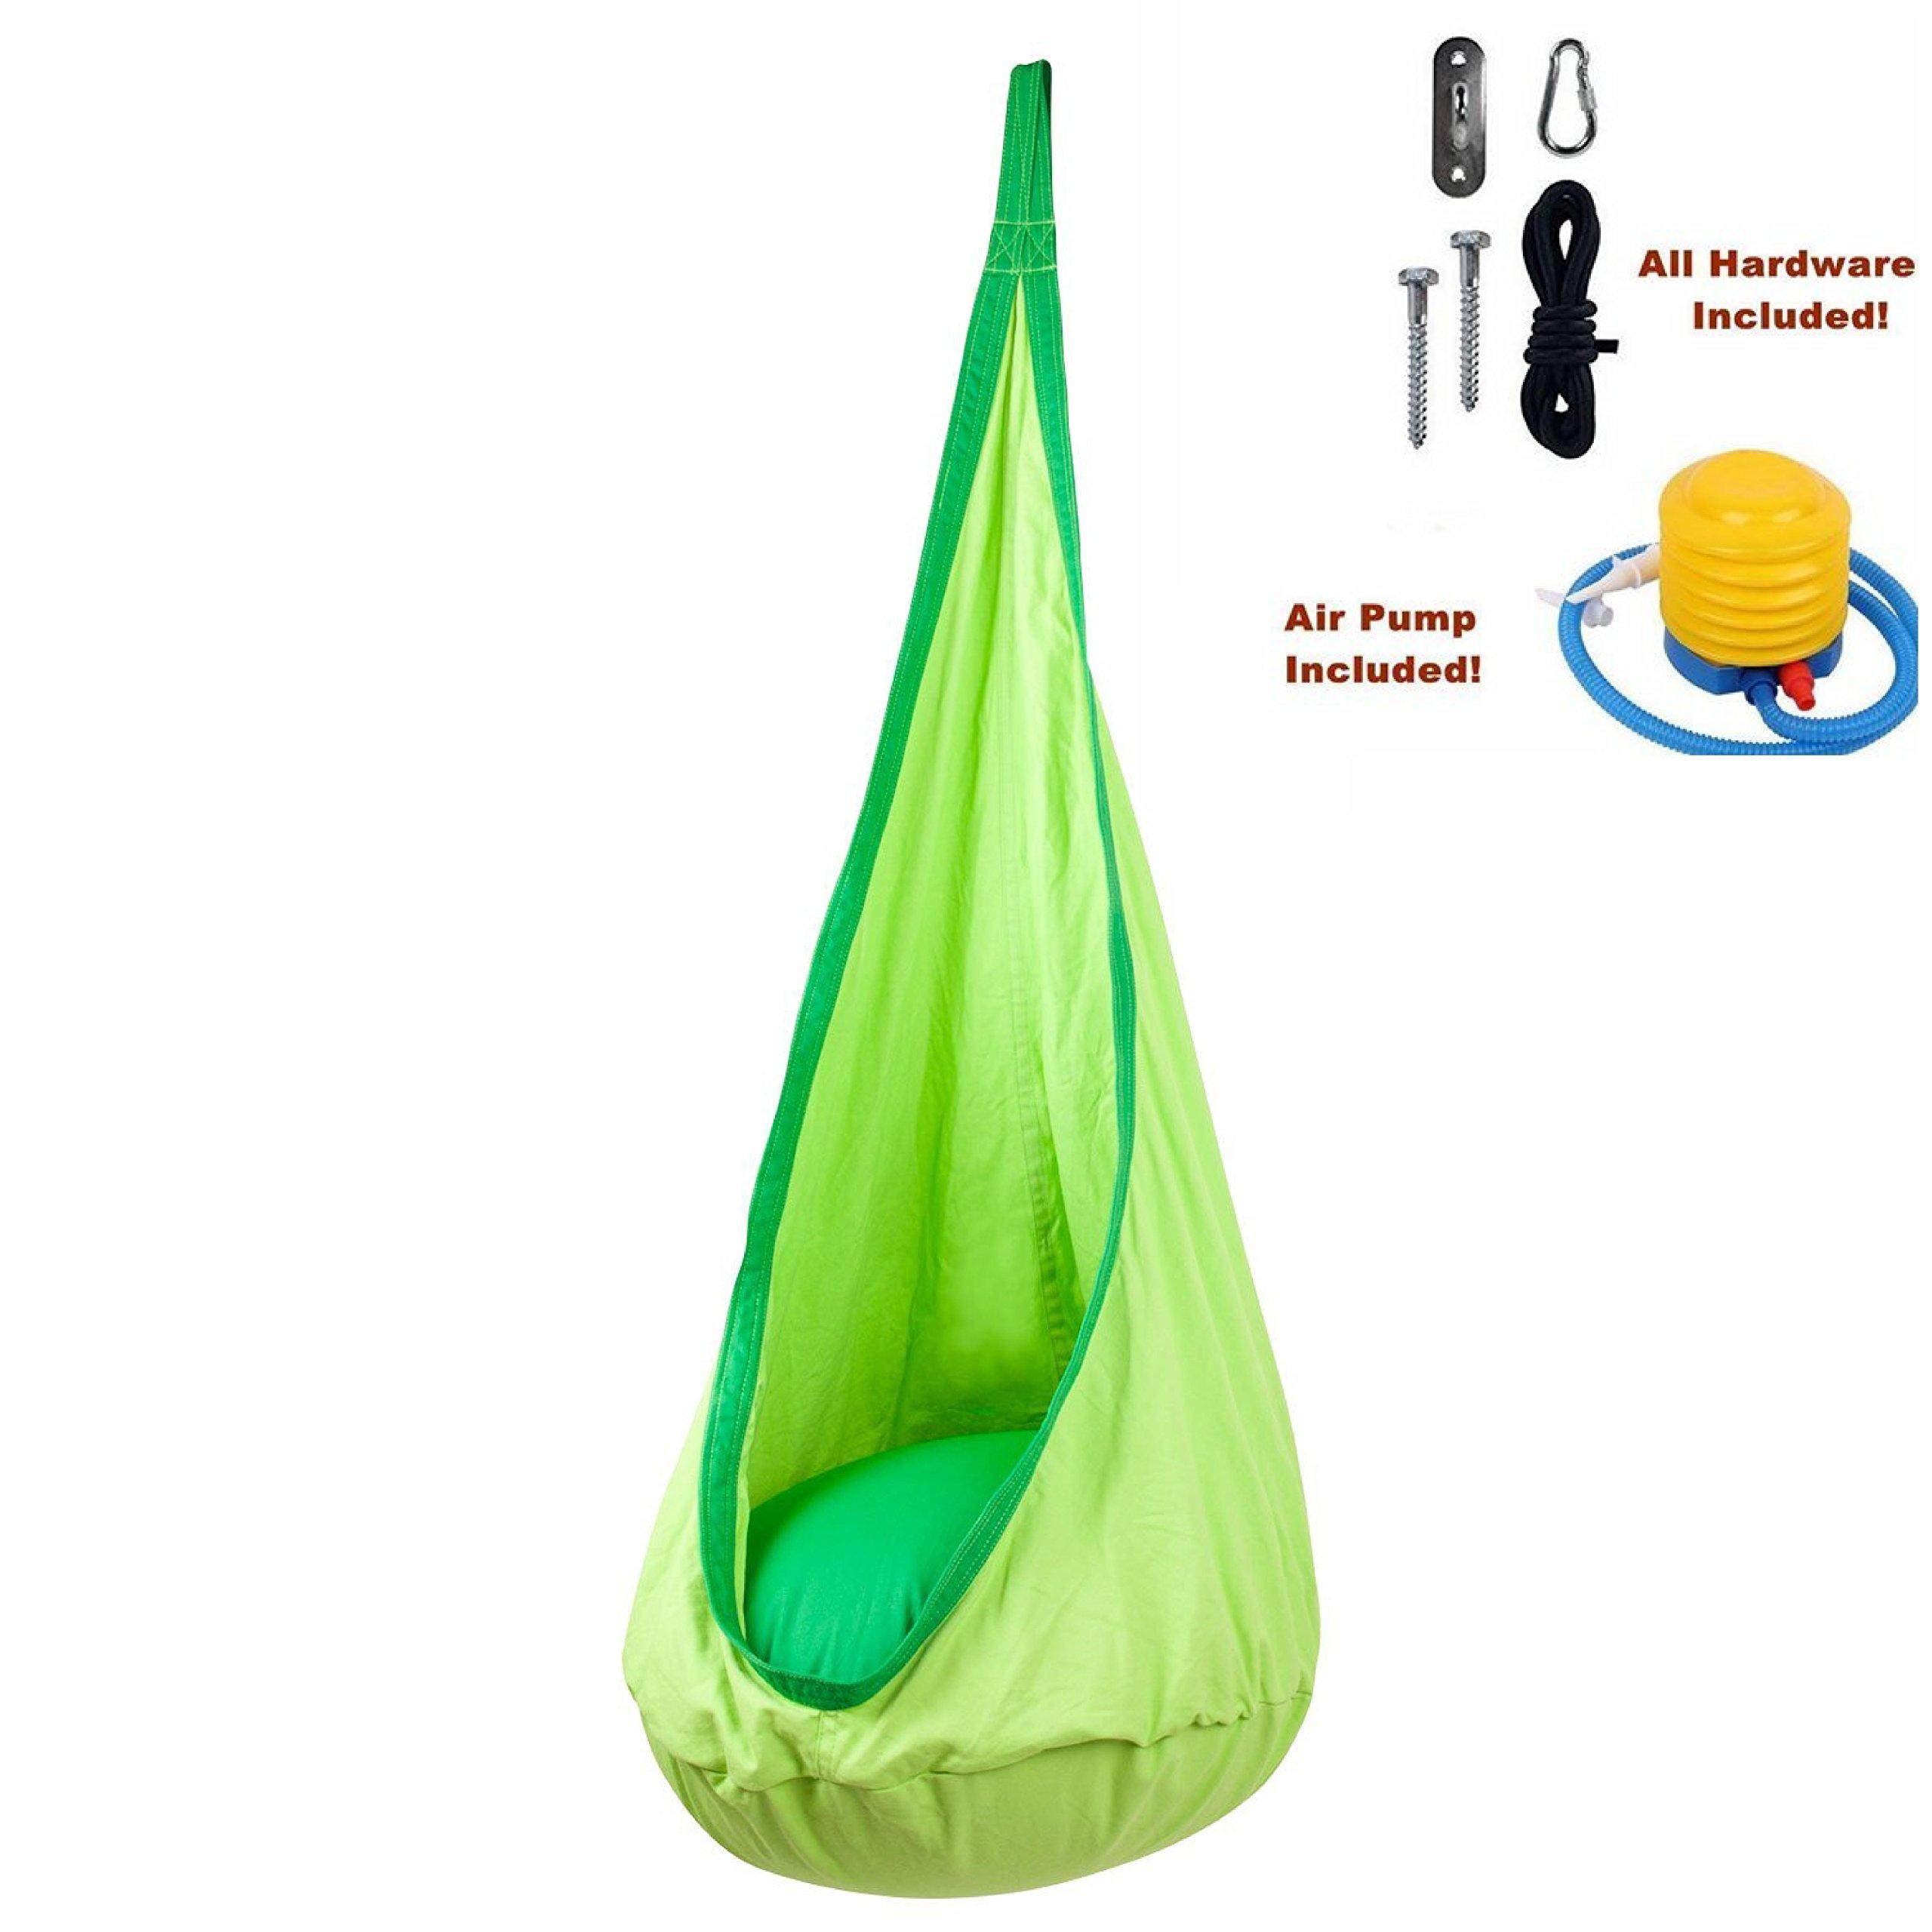 Hanging Hammock Pod Kids Swing/Outdoor and Indoor Children's Hammock Chair Nook Nest Sensory Seat Swing - All Hardware Included (Green)